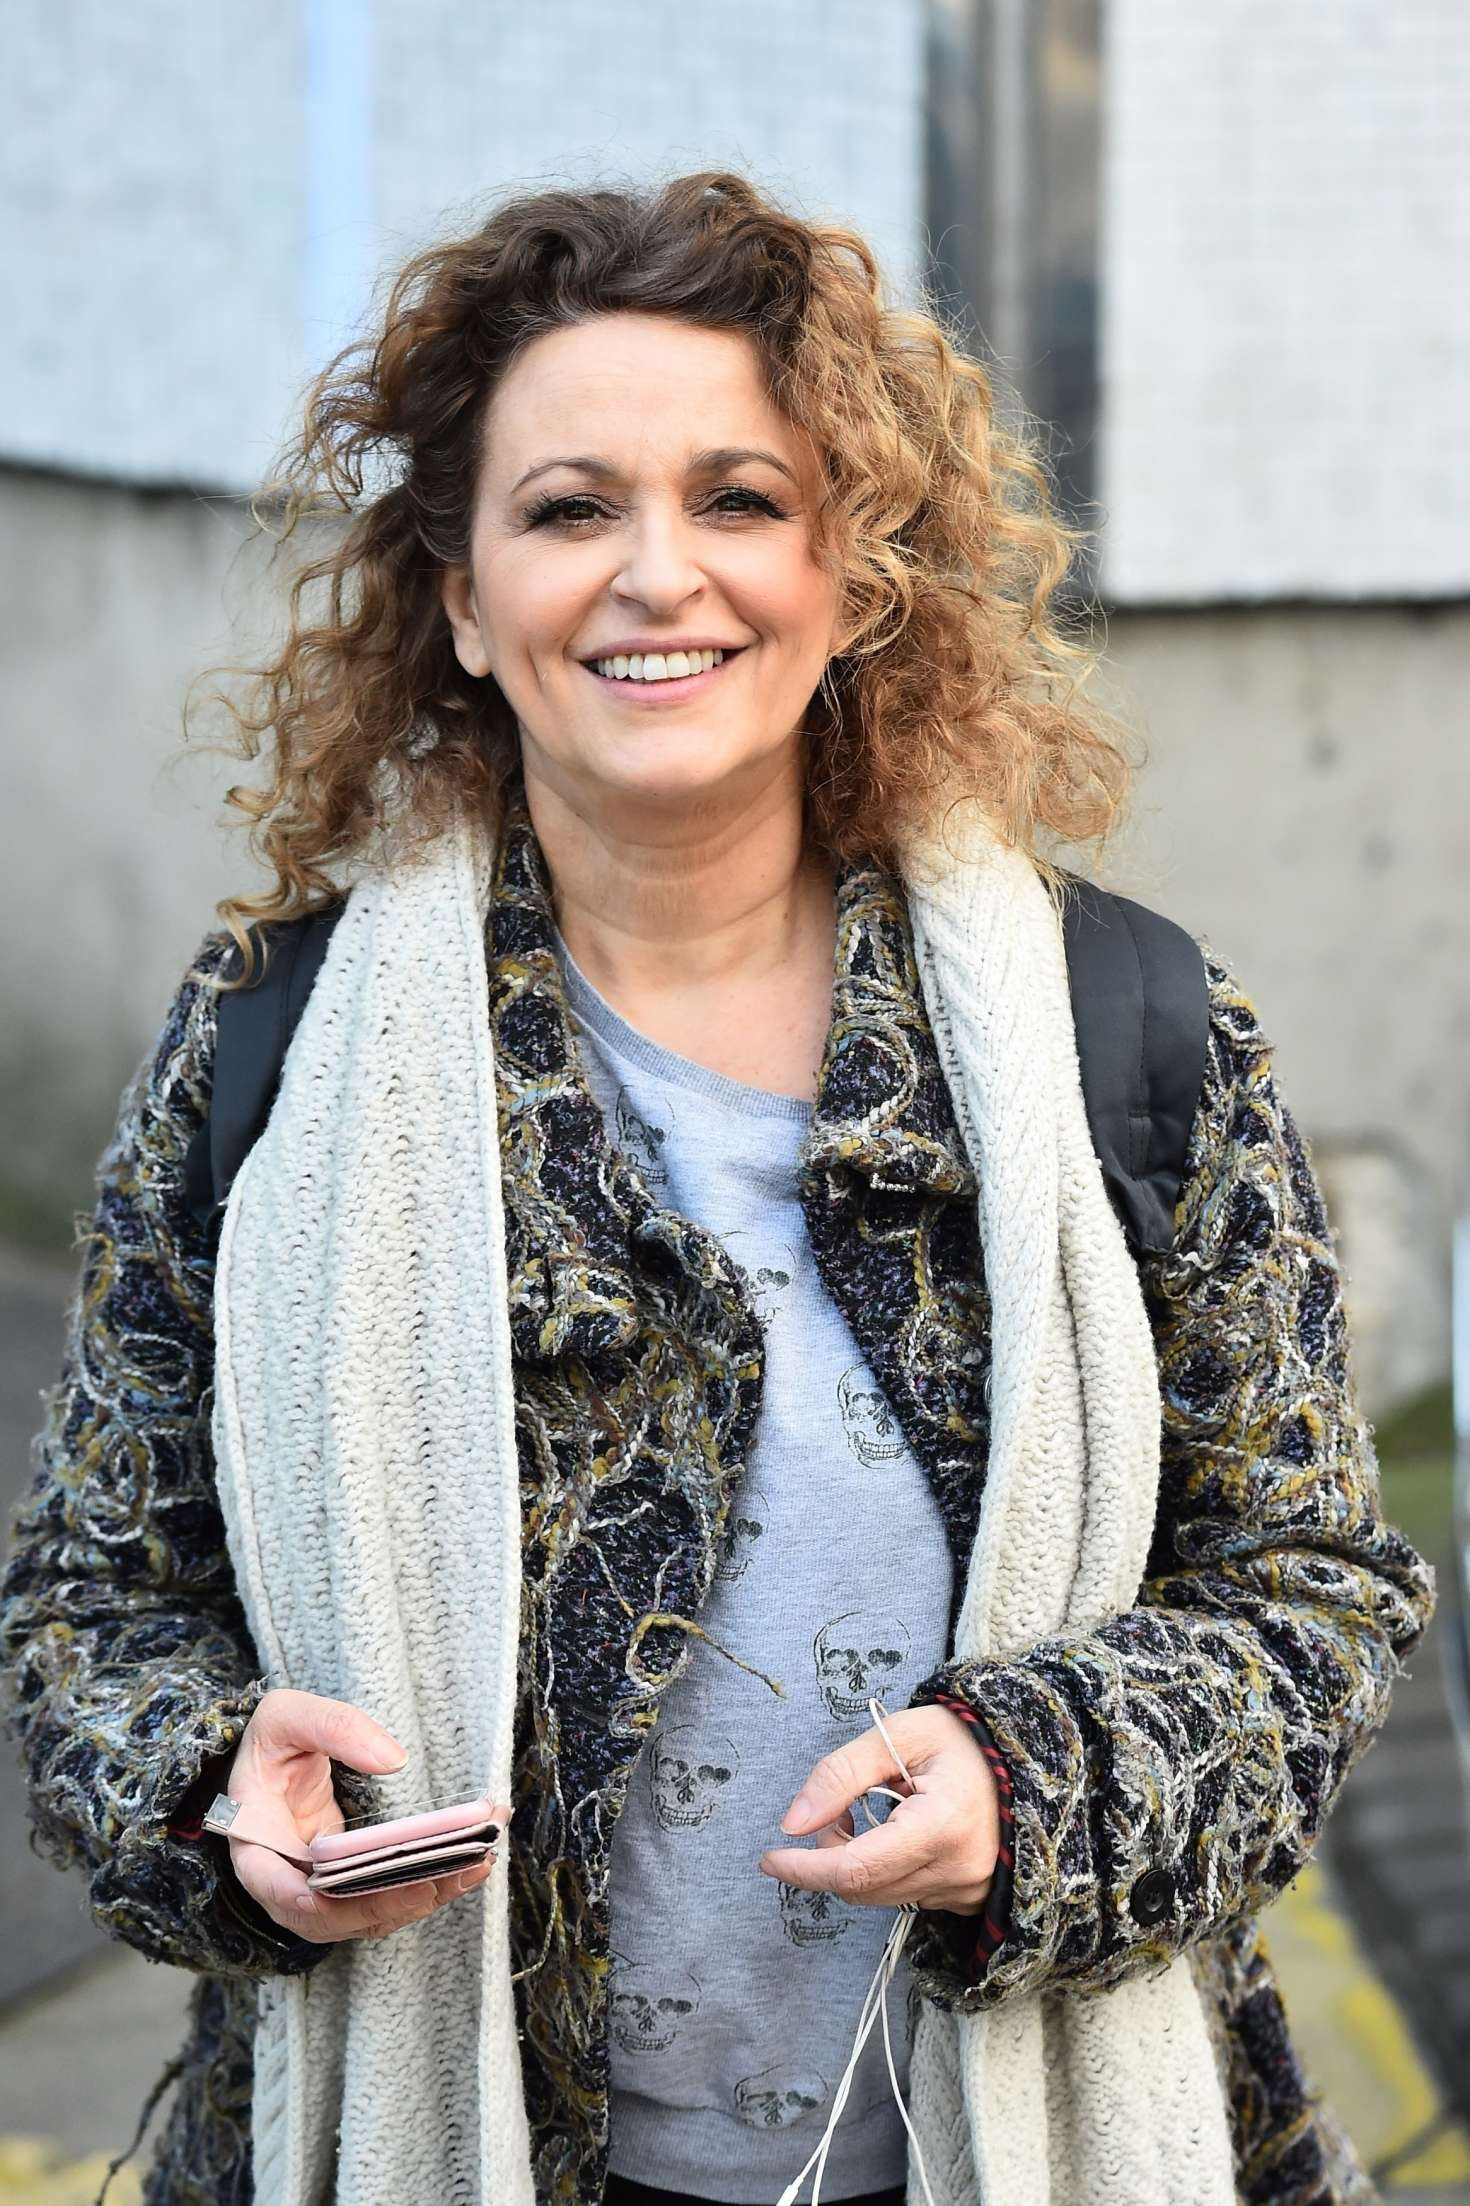 nadia sawalha - photo #8